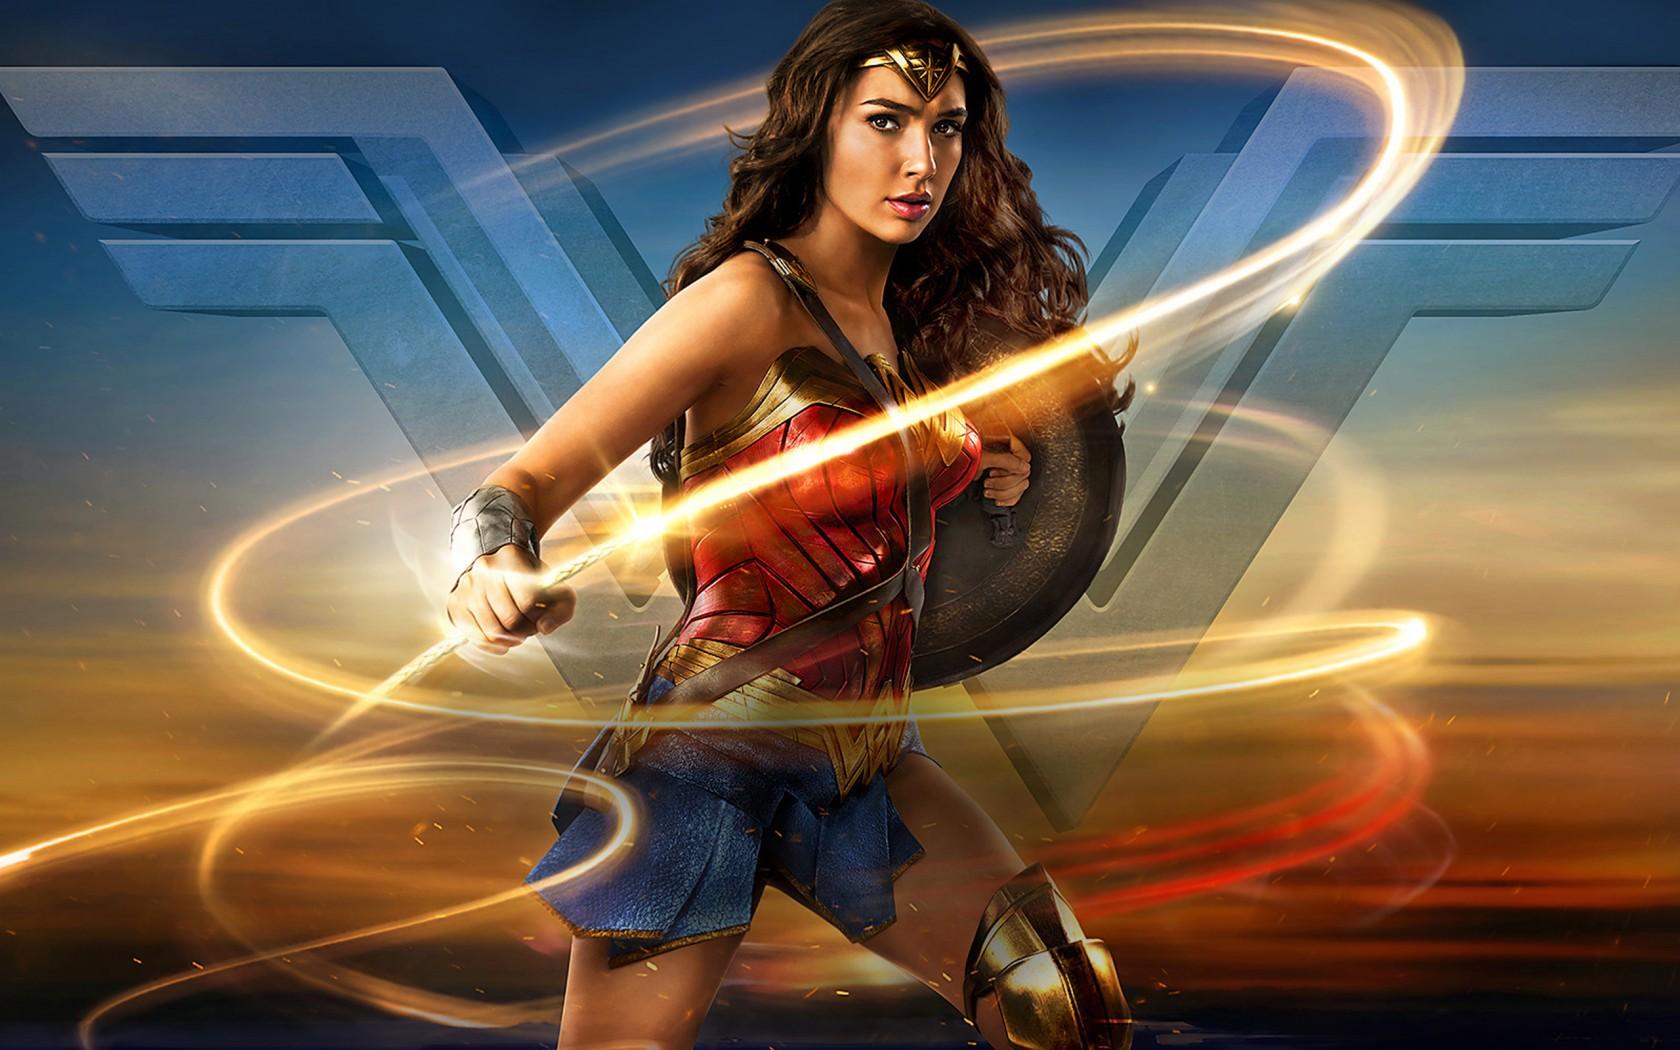 Ipad Hd Wallpaper  Gal Gadot Wonder Woman 2017 Hd Wallpapers Hd Wallpapers